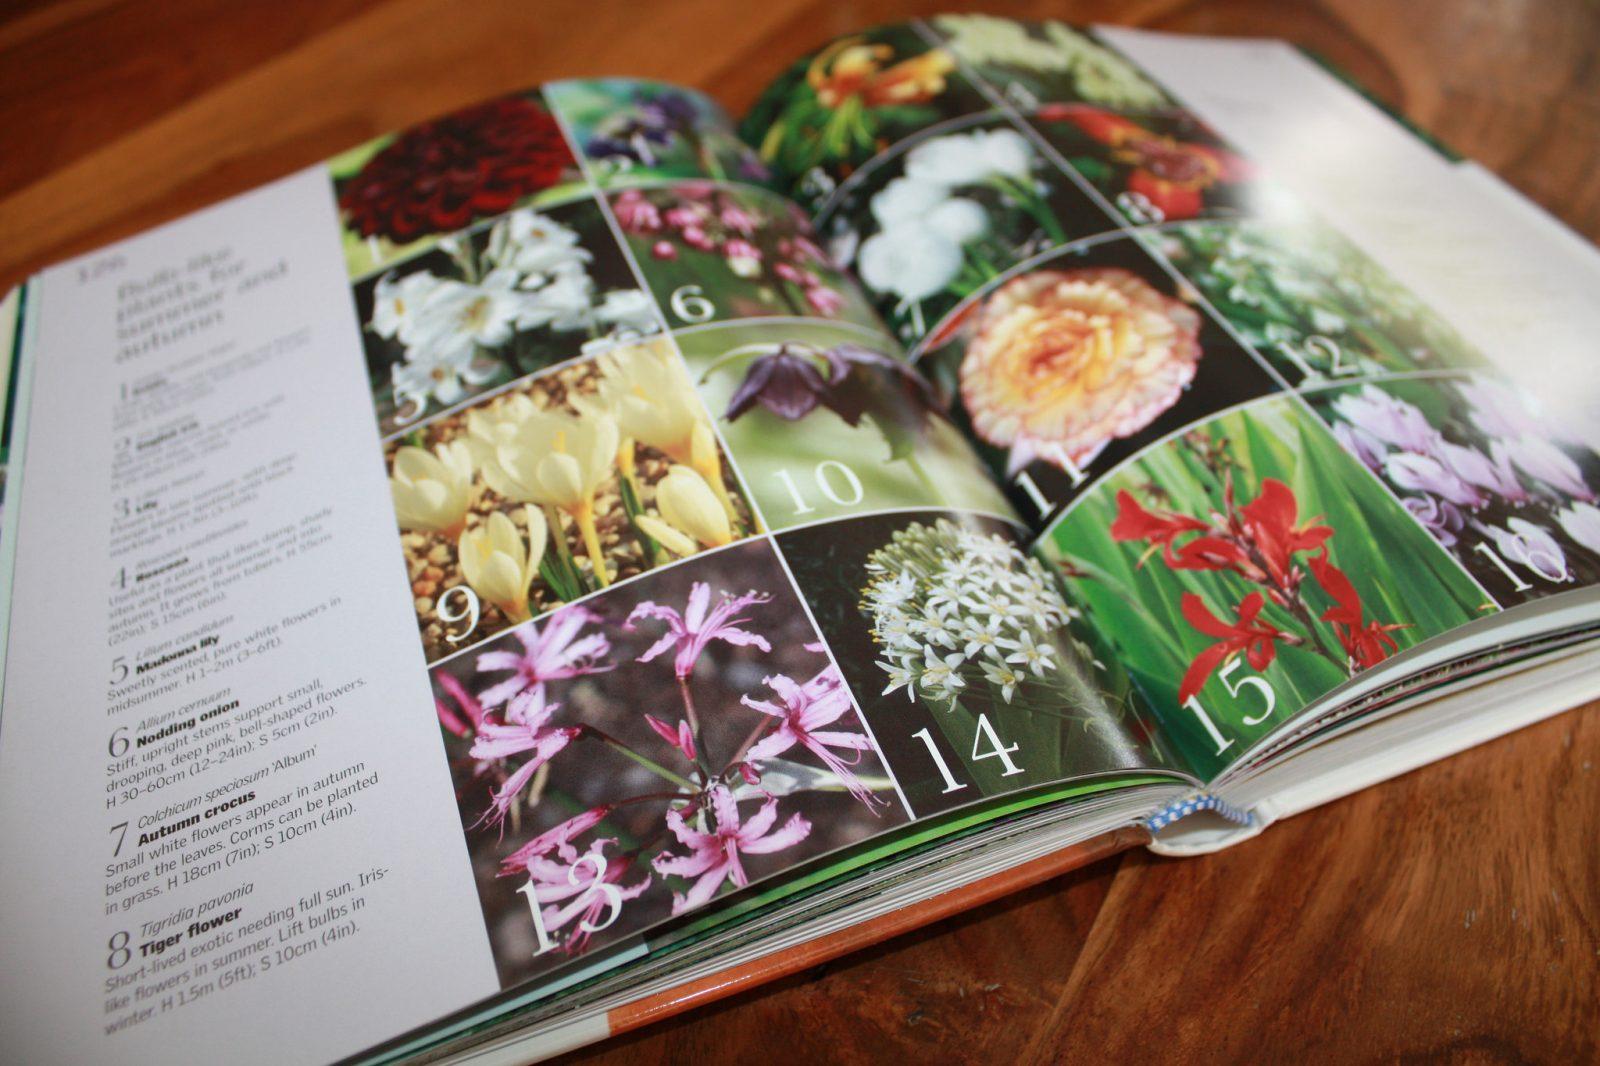 RHS - How to Garden Book